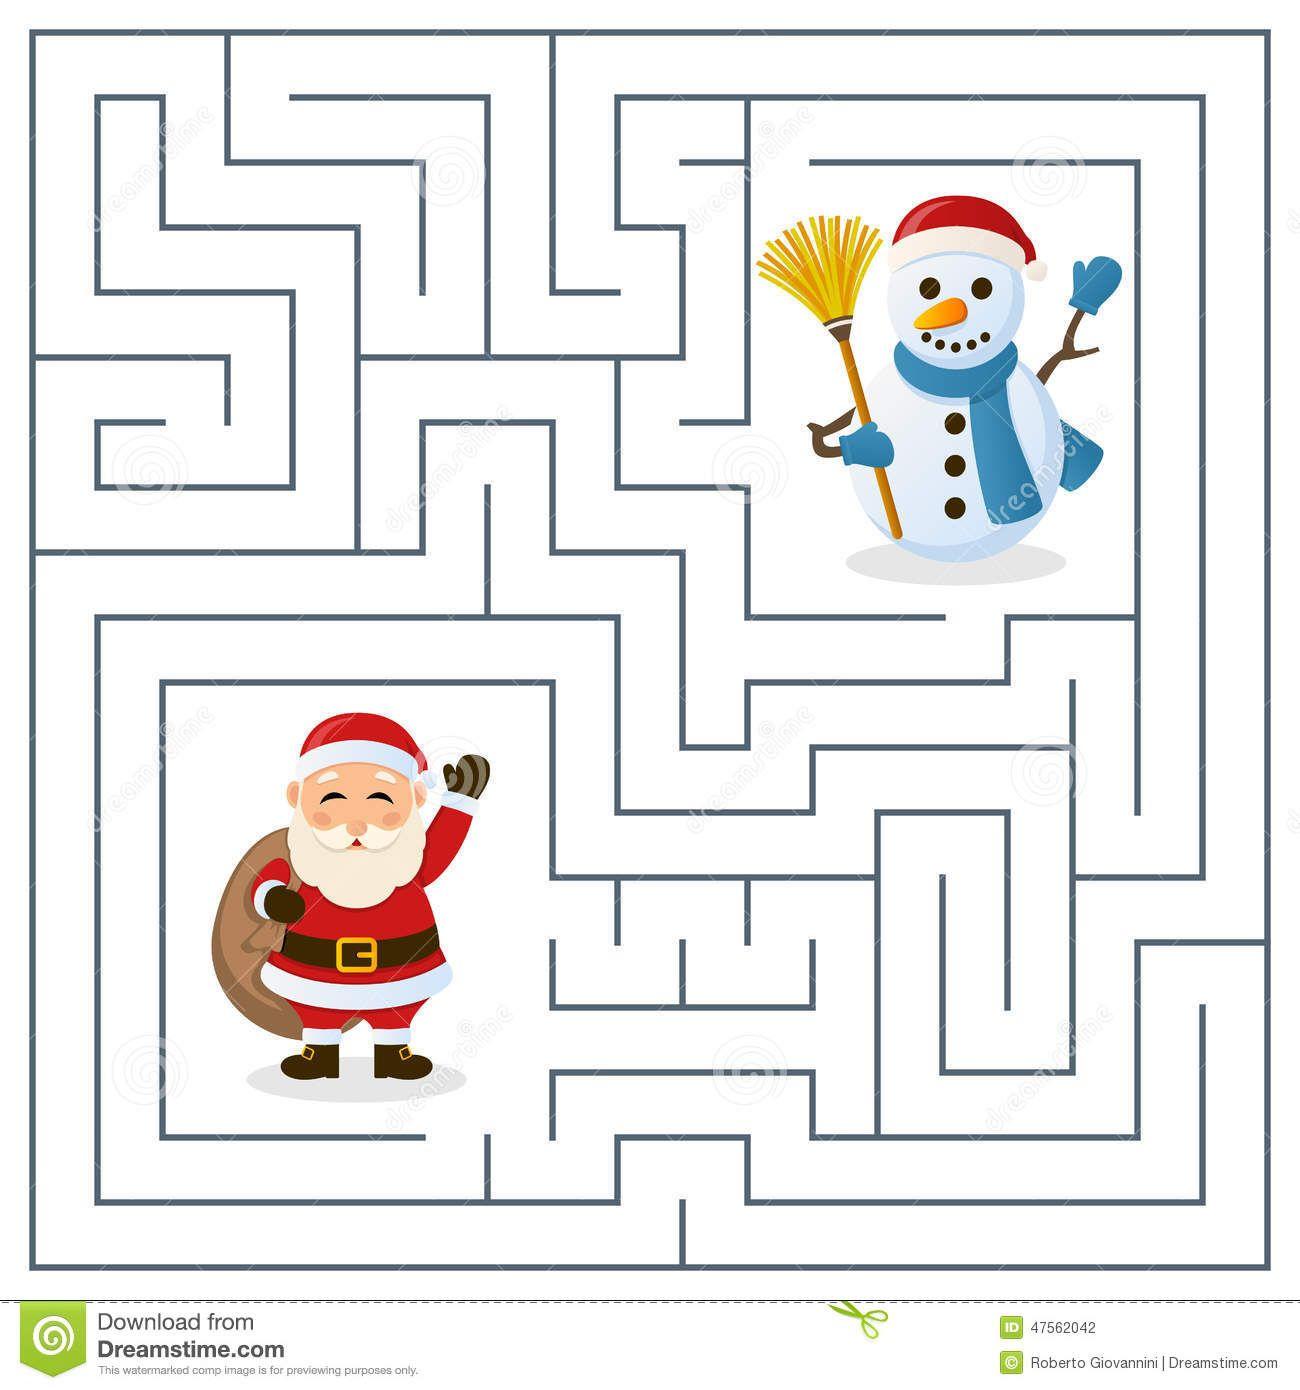 Santa Claus Amp Snowman Maze For Kids